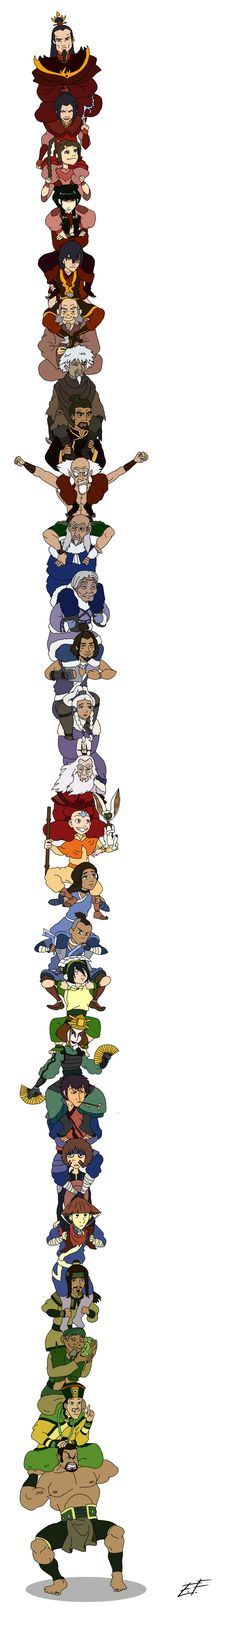 Avatar the last airbender characters on Shoulders! by erinxf.deviantart.com on @deviantART